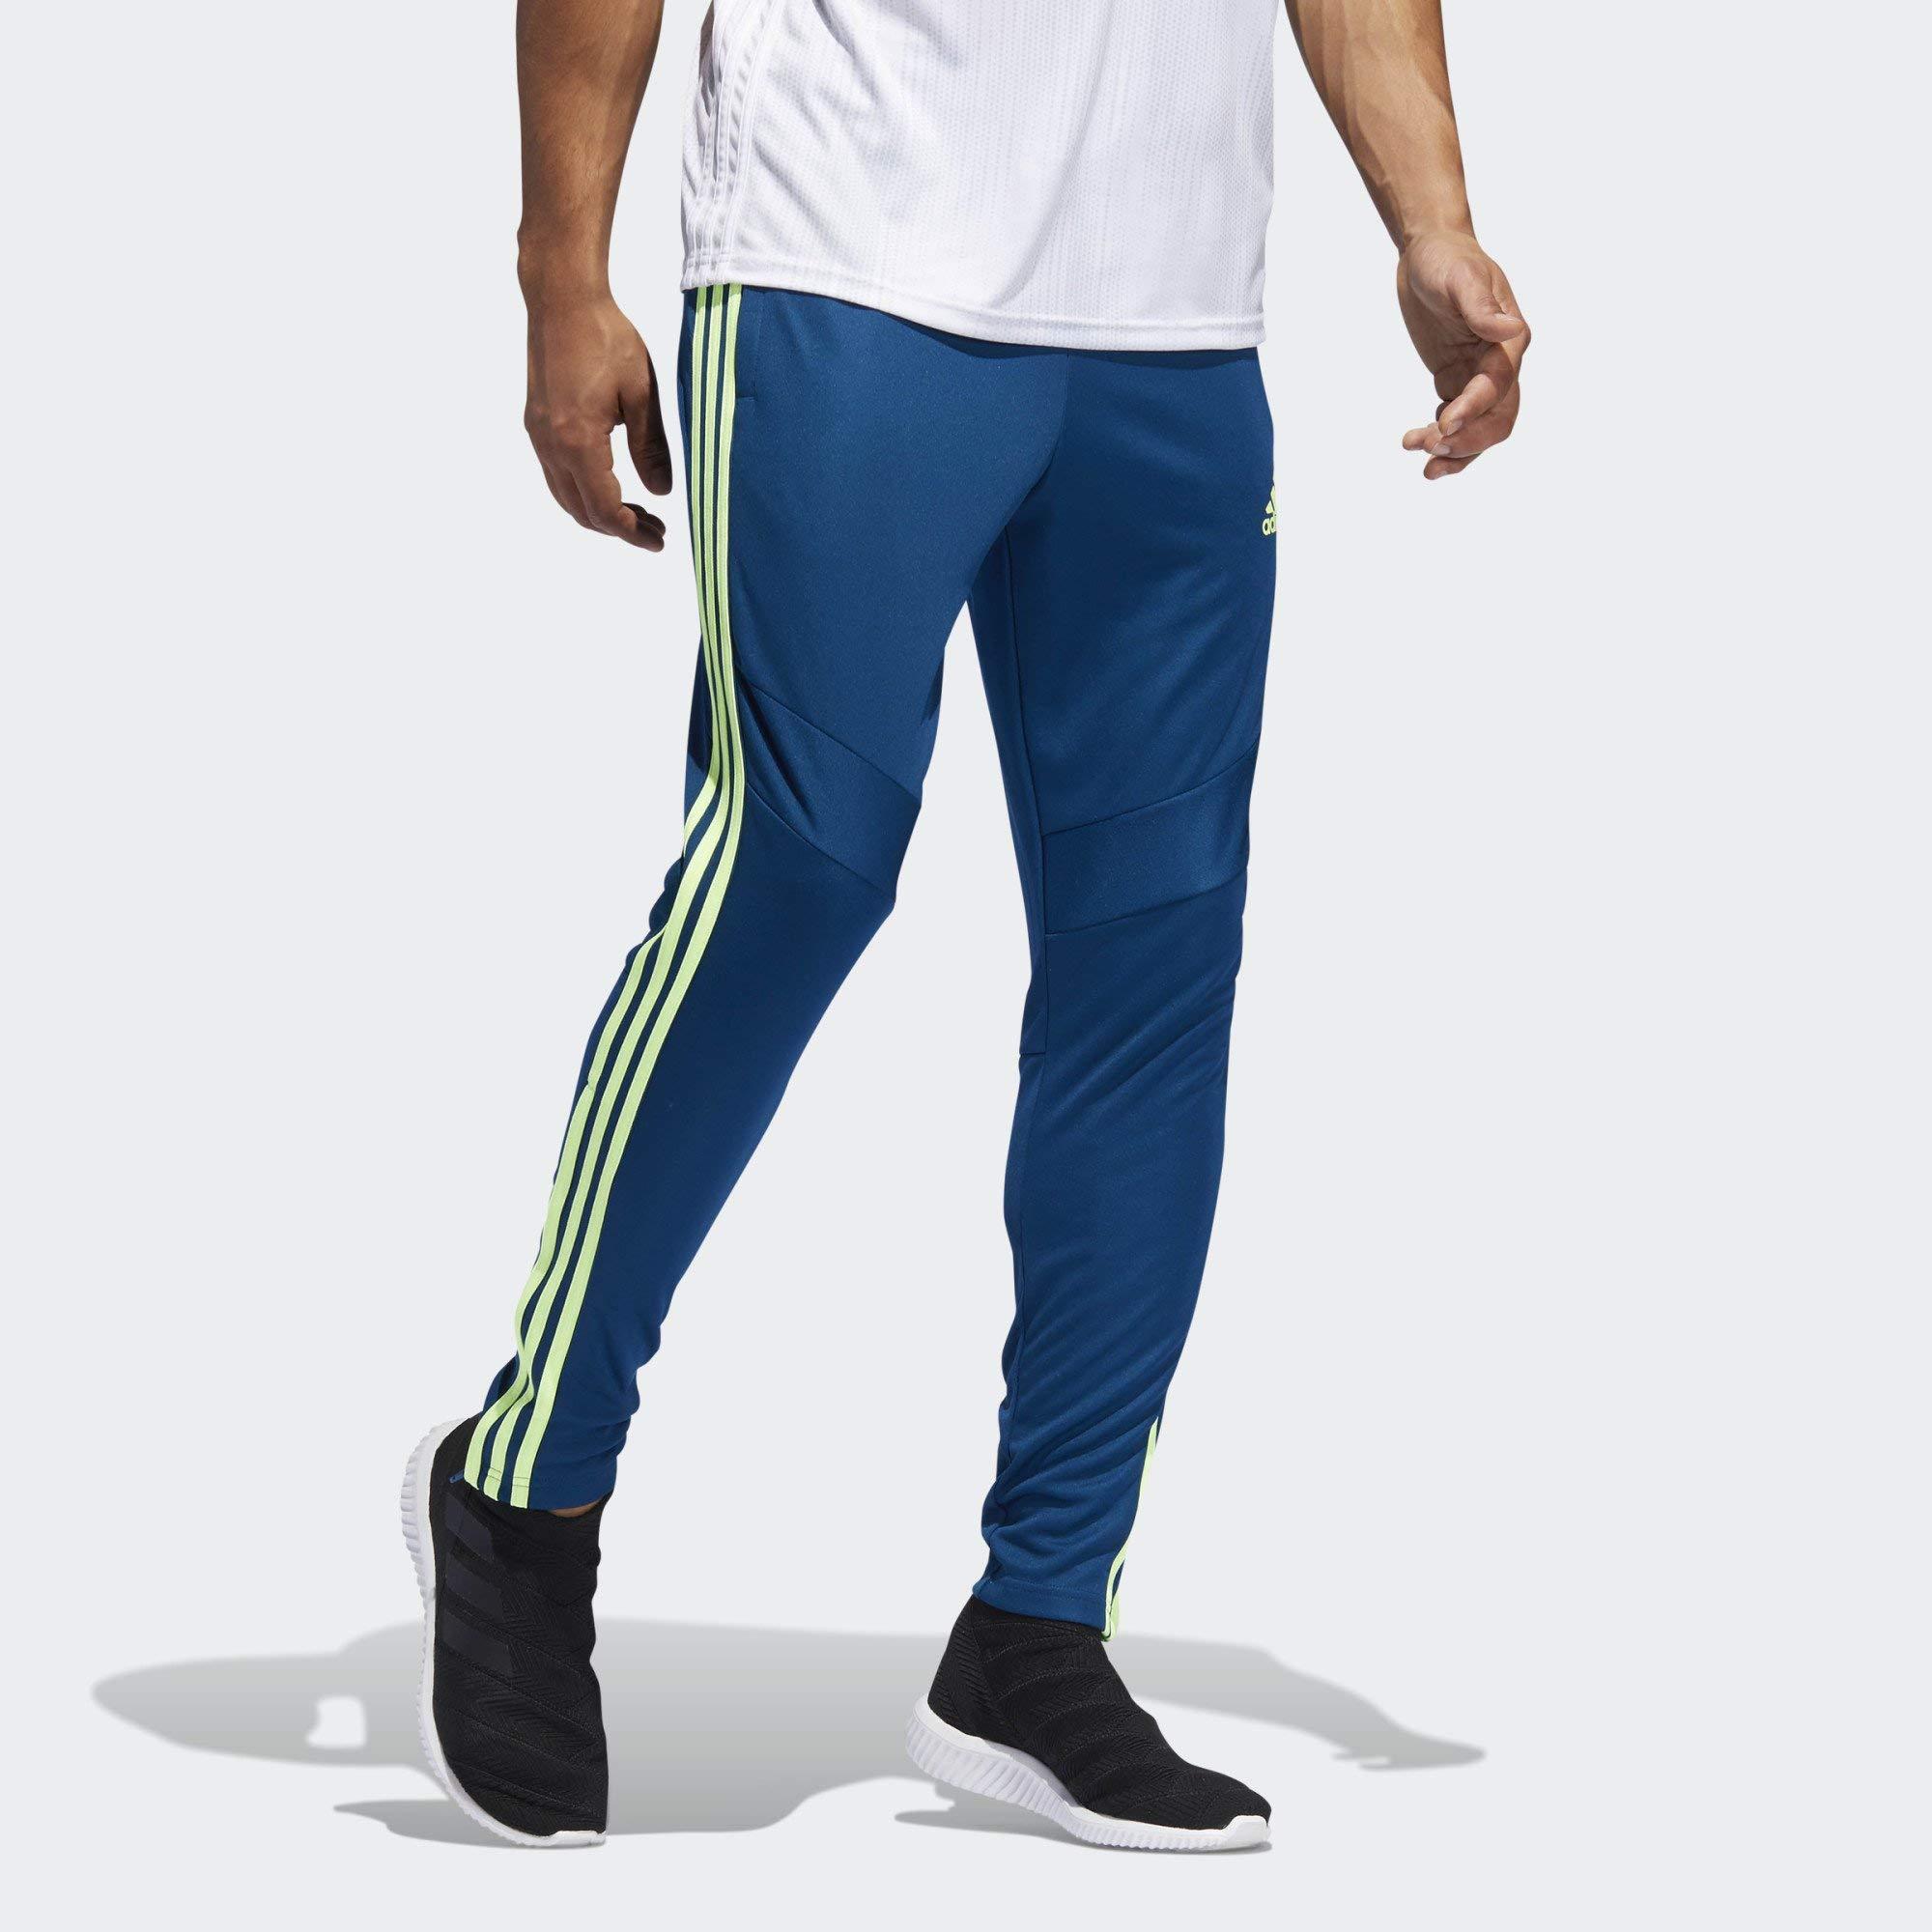 adidas Men's Soccer Tiro 19 Training Pant, Legend